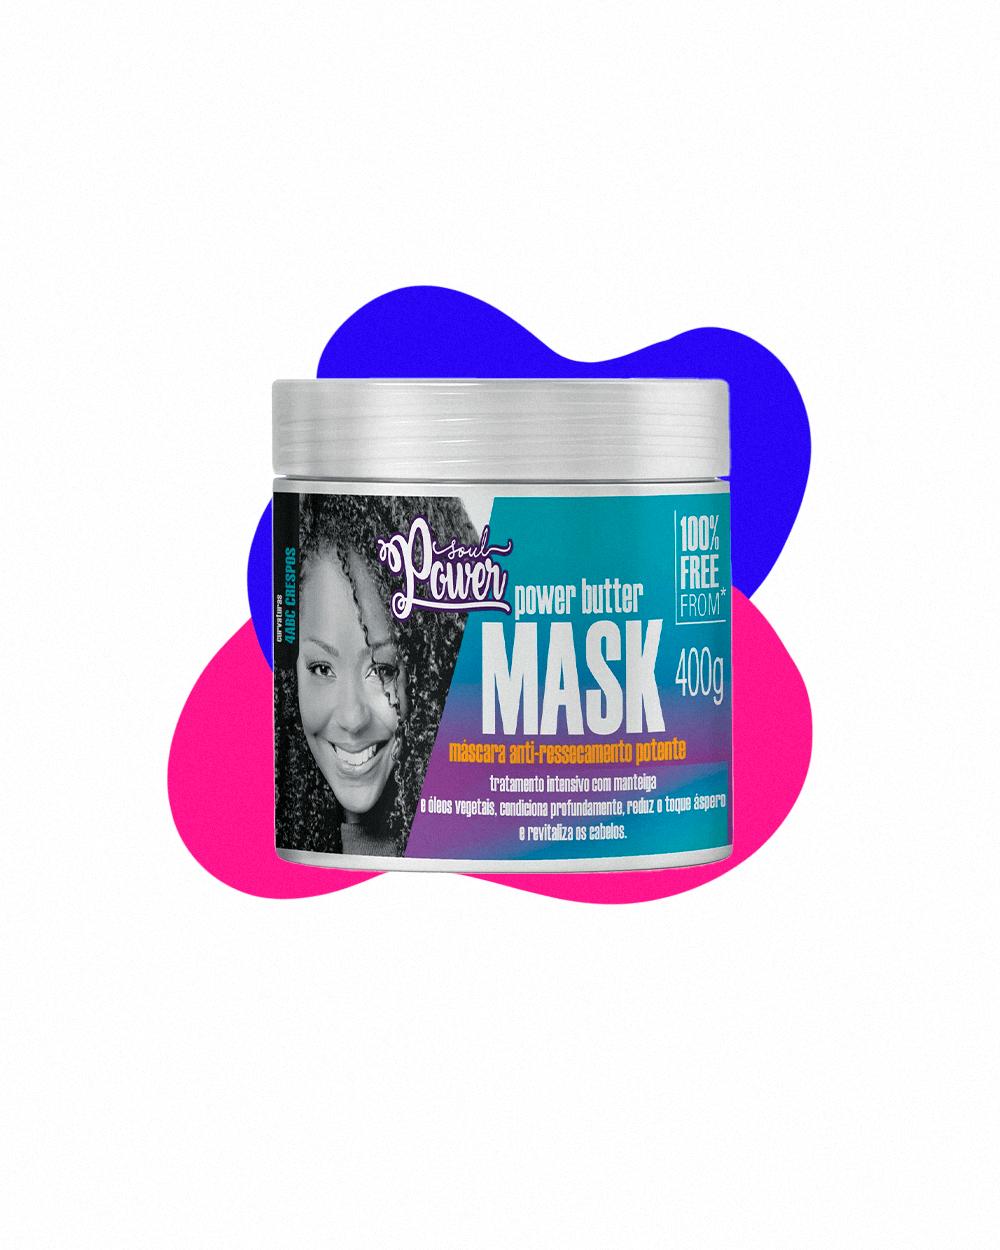 power butter  - crespos e cacheados  - tratamento capilar  - cuidados com os cabelos  - máscara para cabelos crespos  - https://stealthelook.com.br